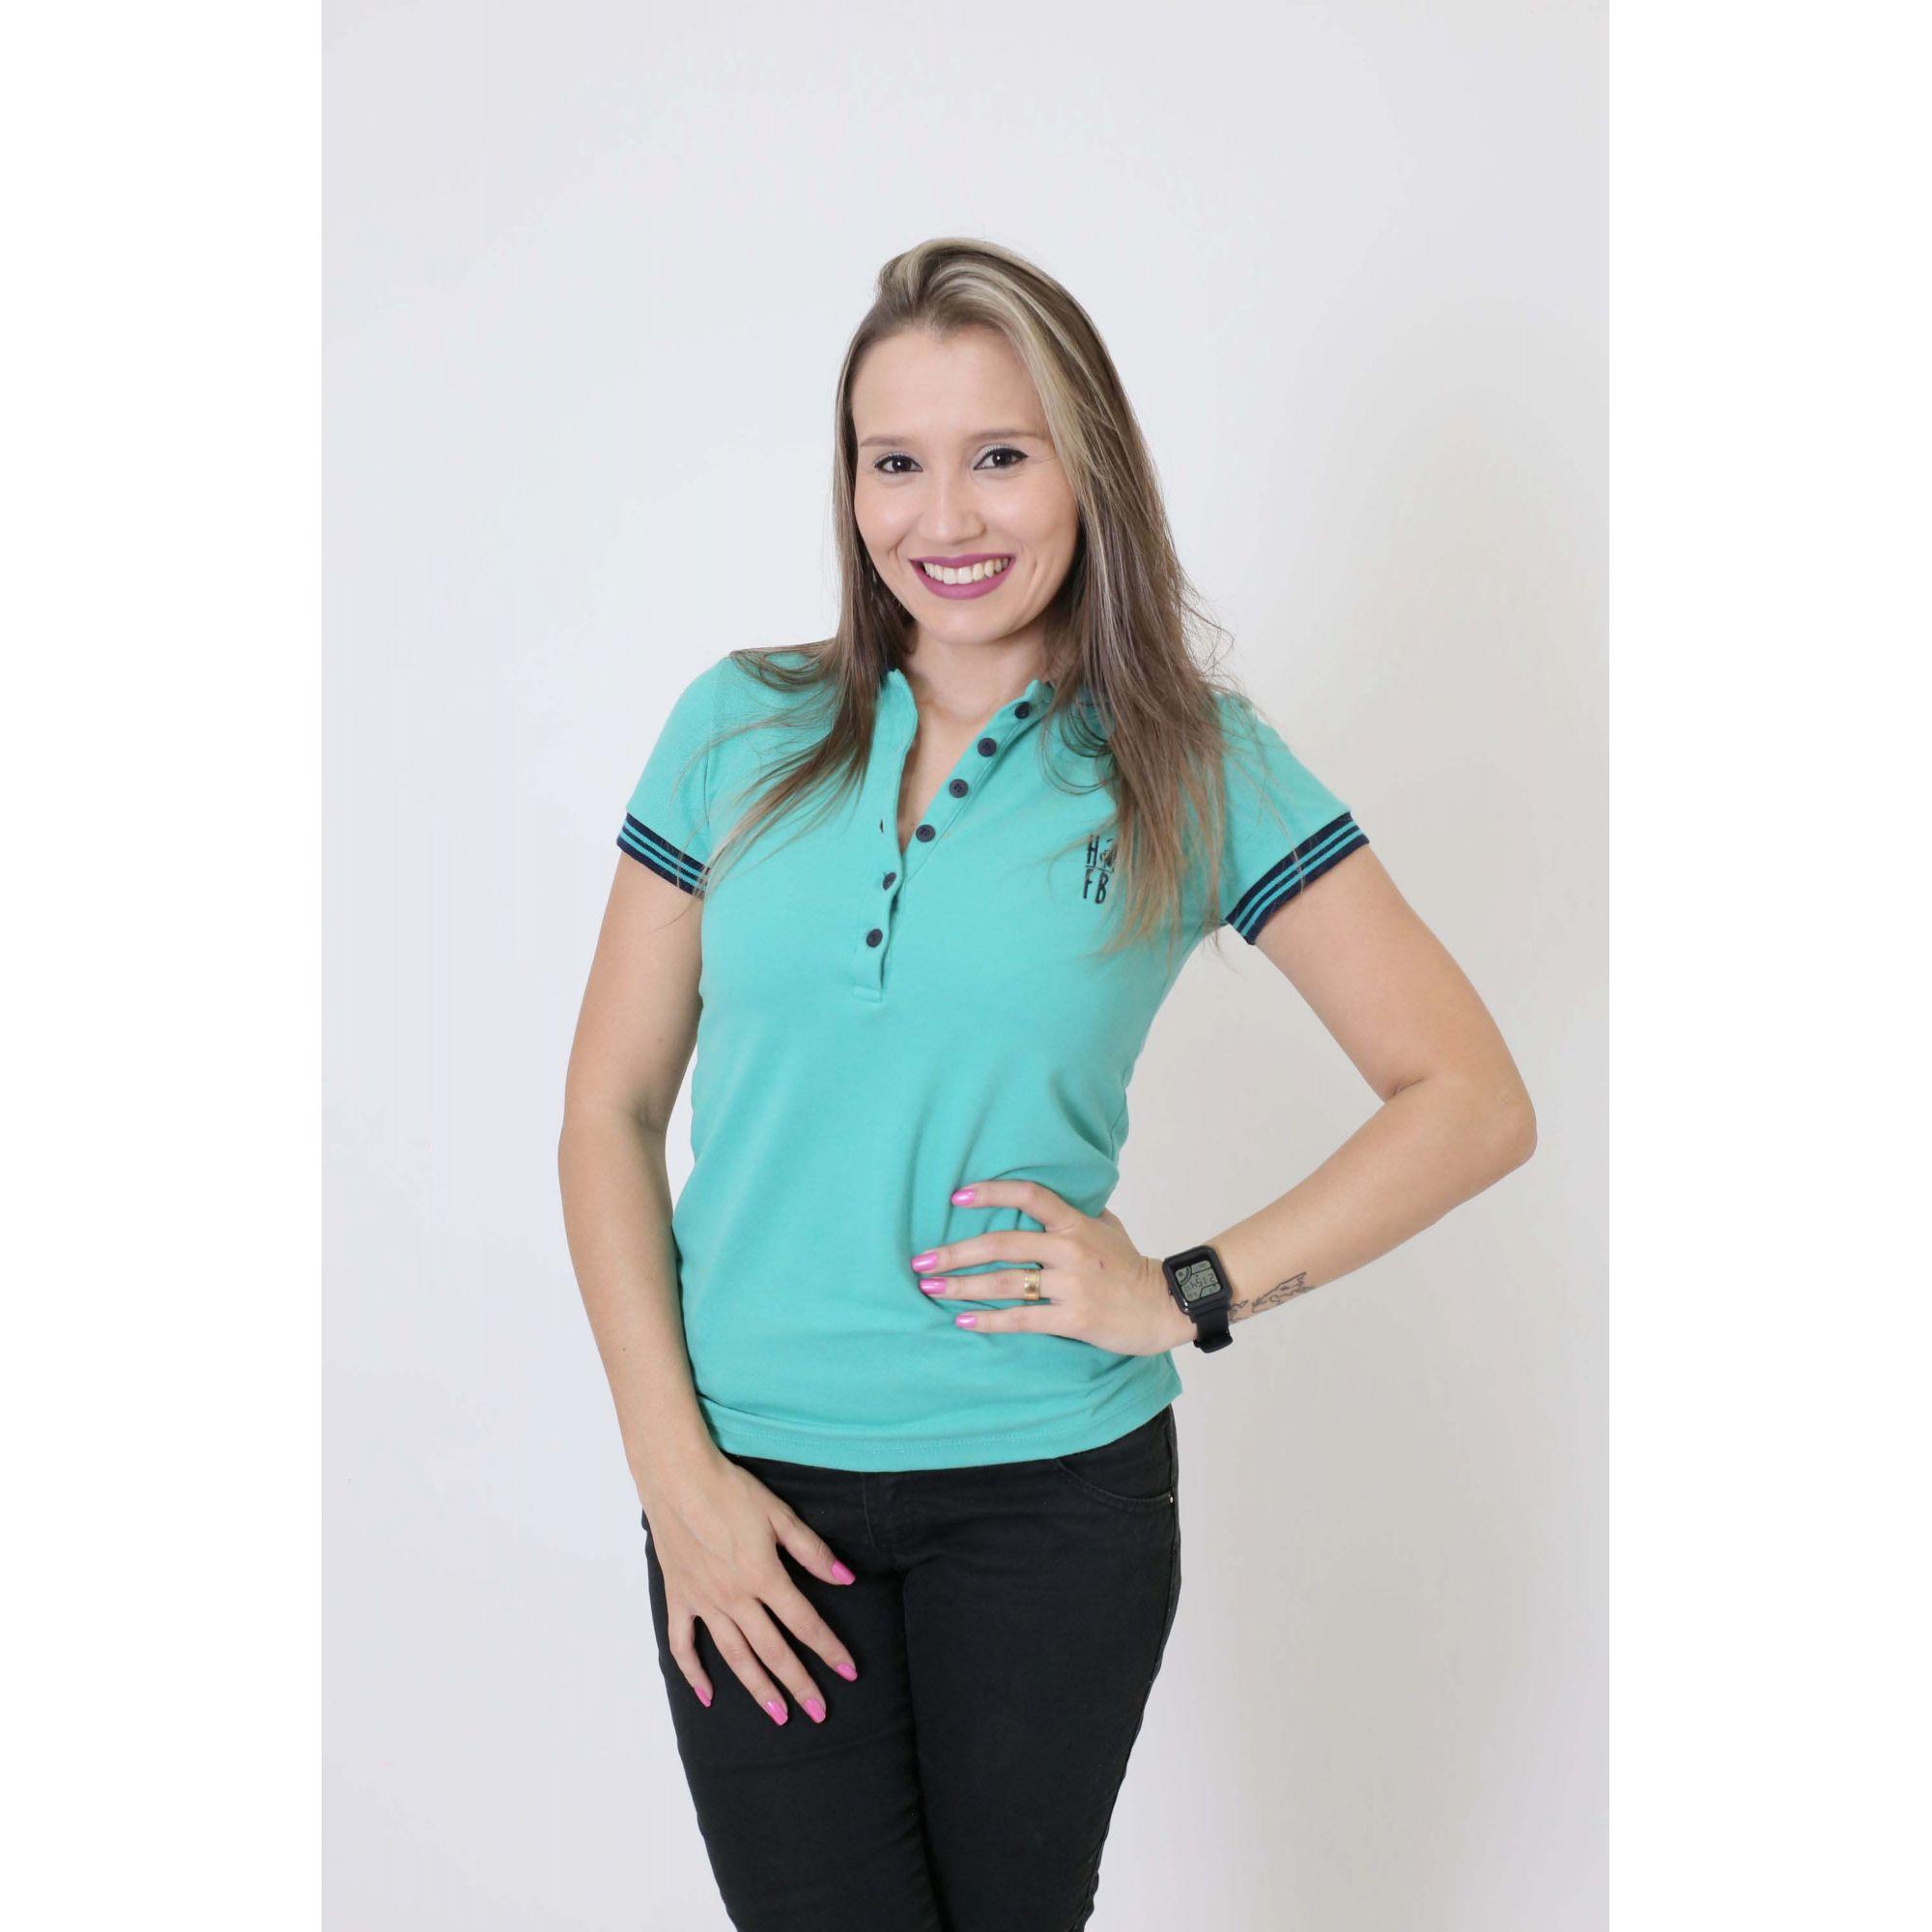 MÃE E FILHO > Kit 02 Peças - Camisas ou Body Polo Verde Jade [Coleção Tal Mãe Tal Filho]  - Heitor Fashion Brazil